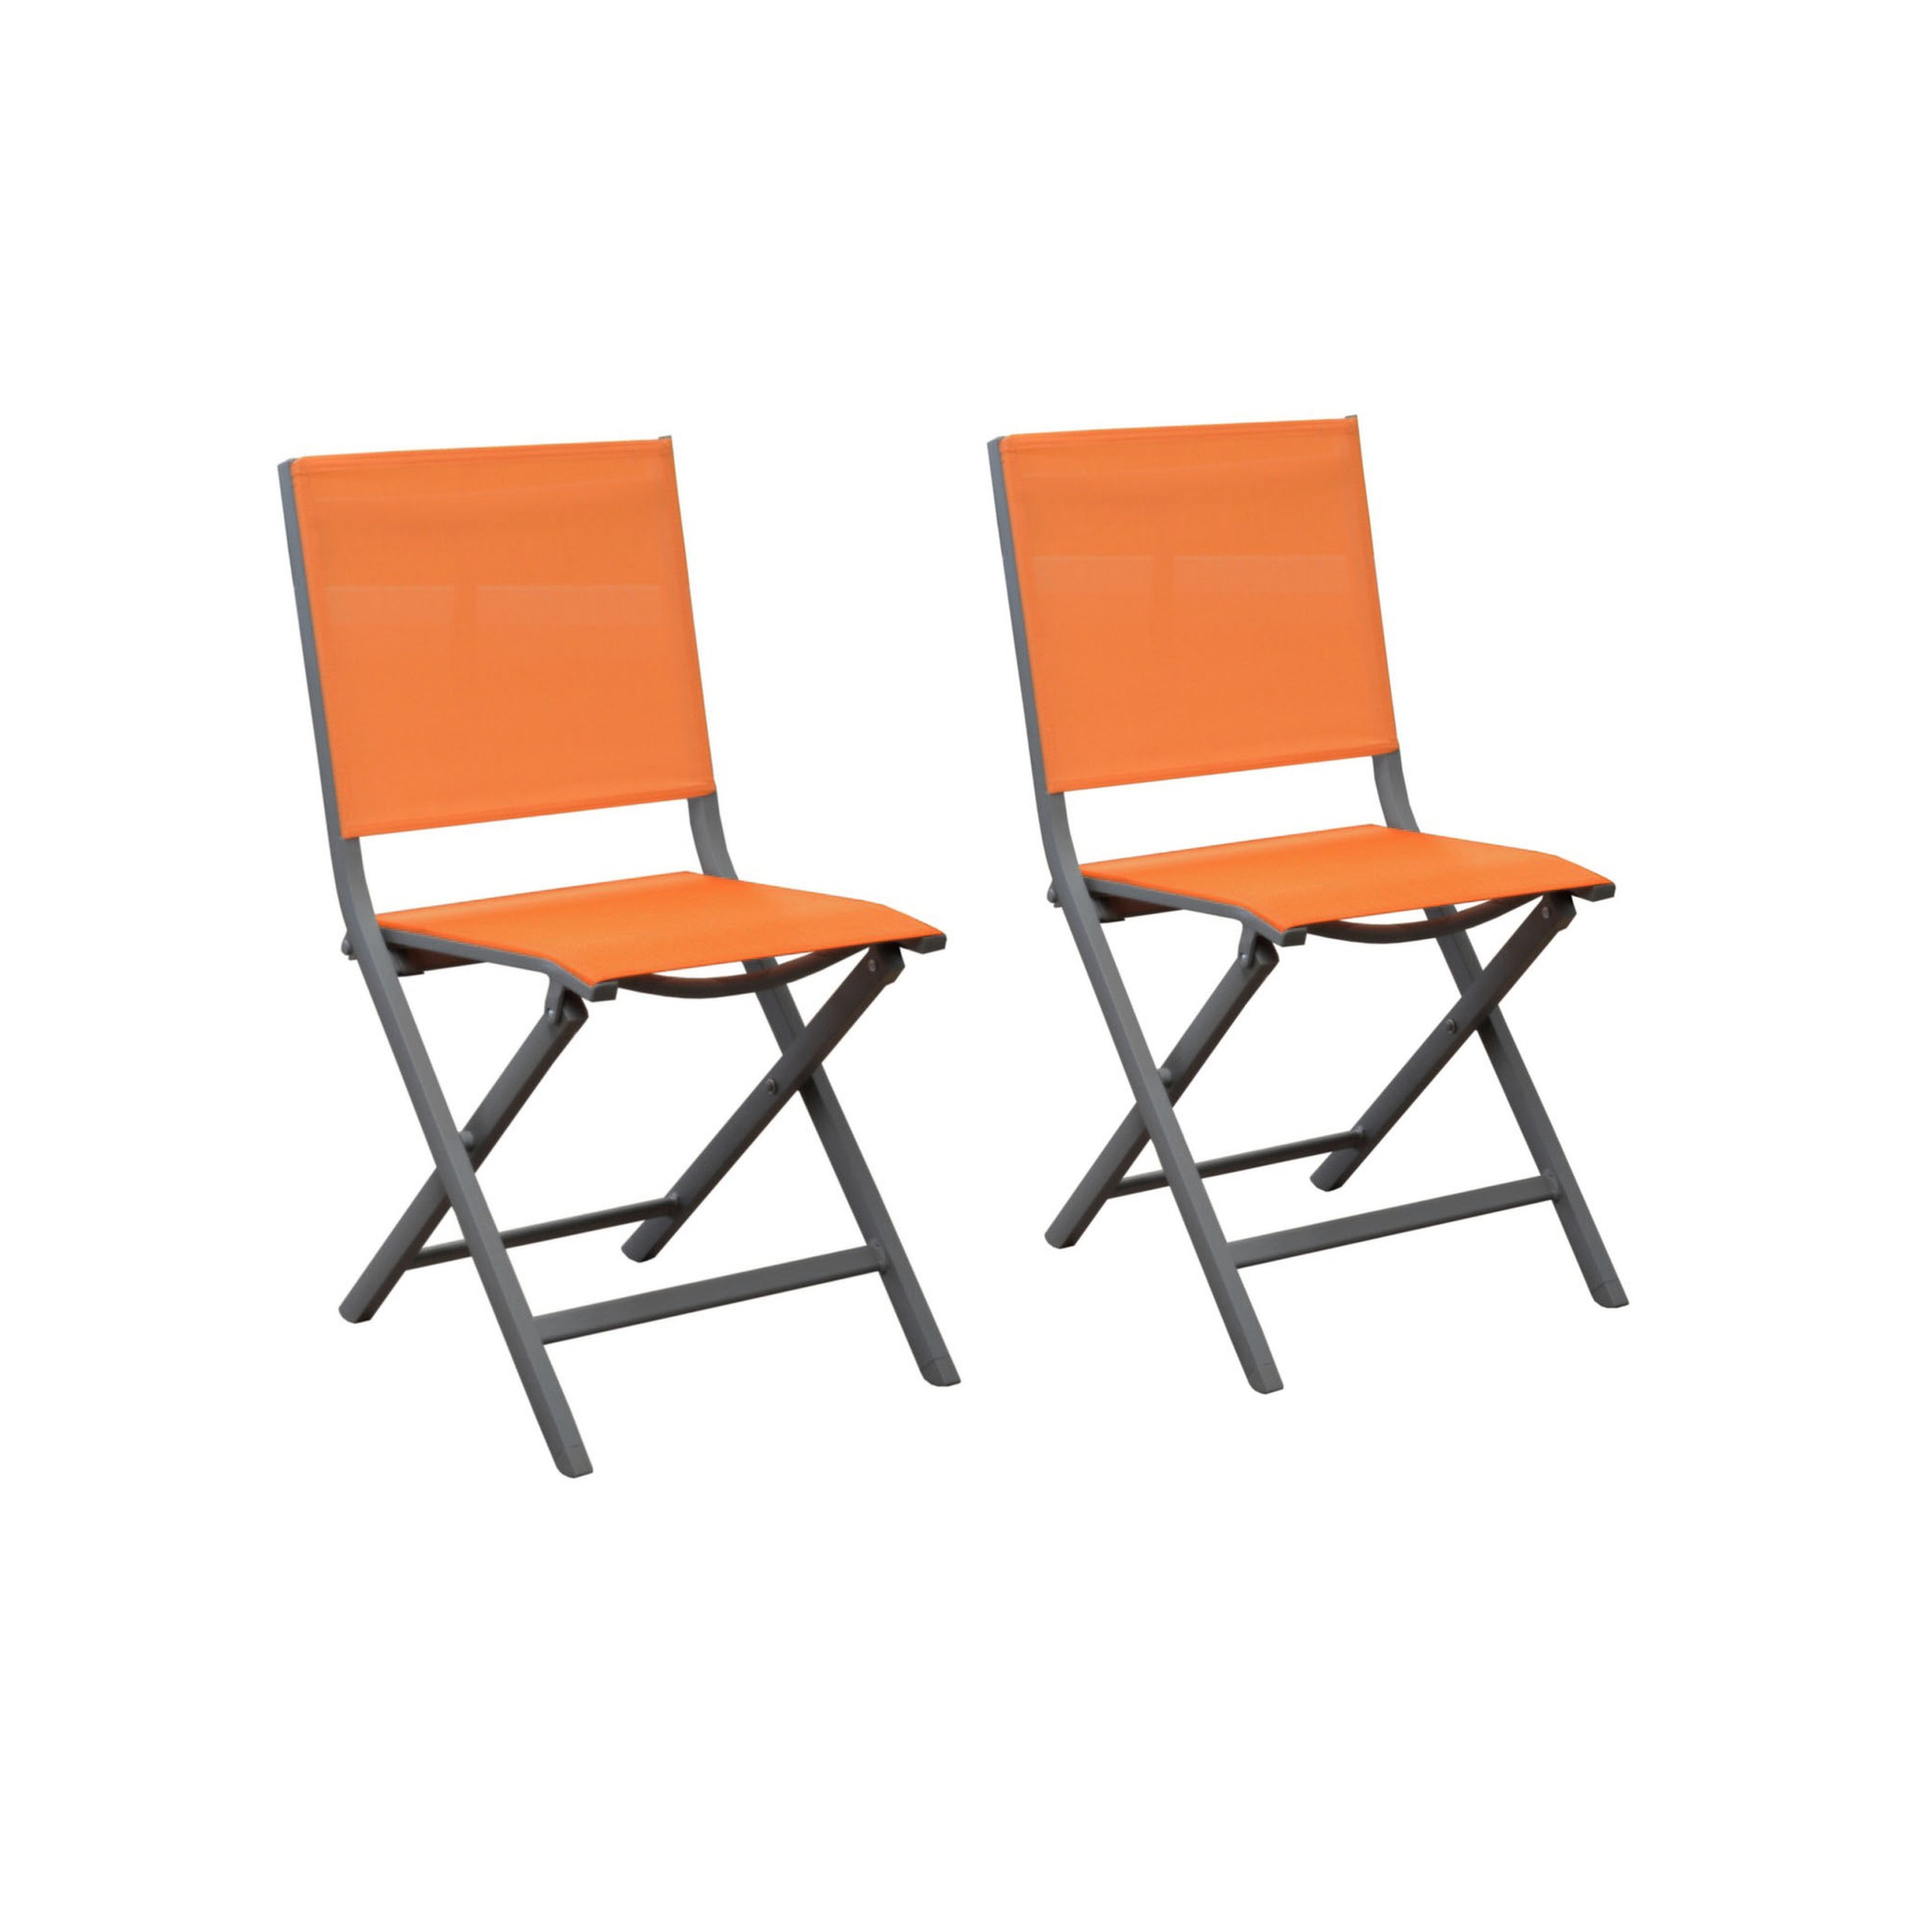 Chaise Orange Chaise Jardin Jardin Orange Orange Jardin Orange Orange Chaise Chaise Jardin QdtrBoshCx